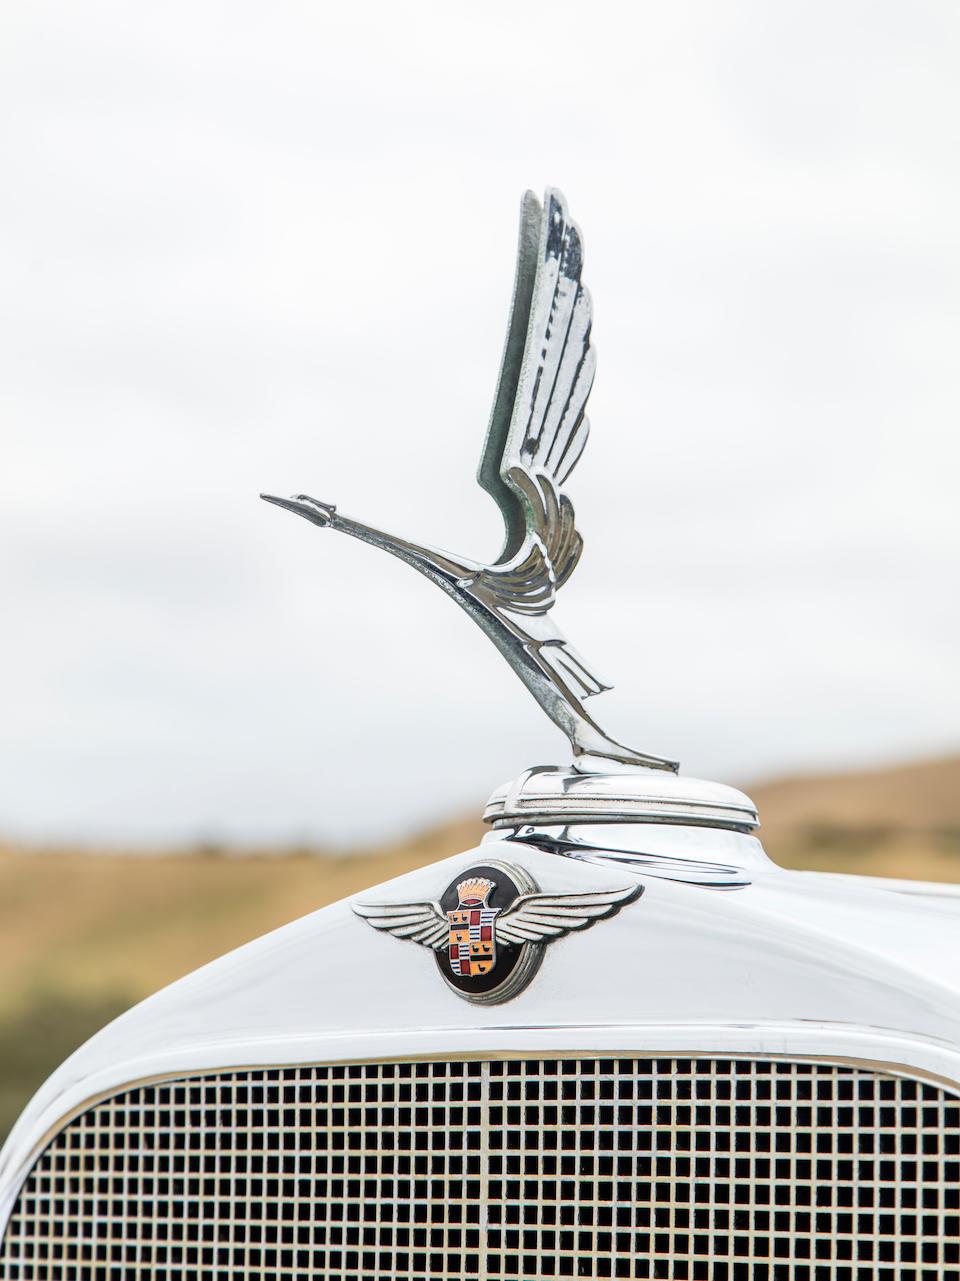 <b>1932 Cadillac 55-B V-8 Convertible Coupe</b><br />Engine no. 1202418<br />Body no. 124